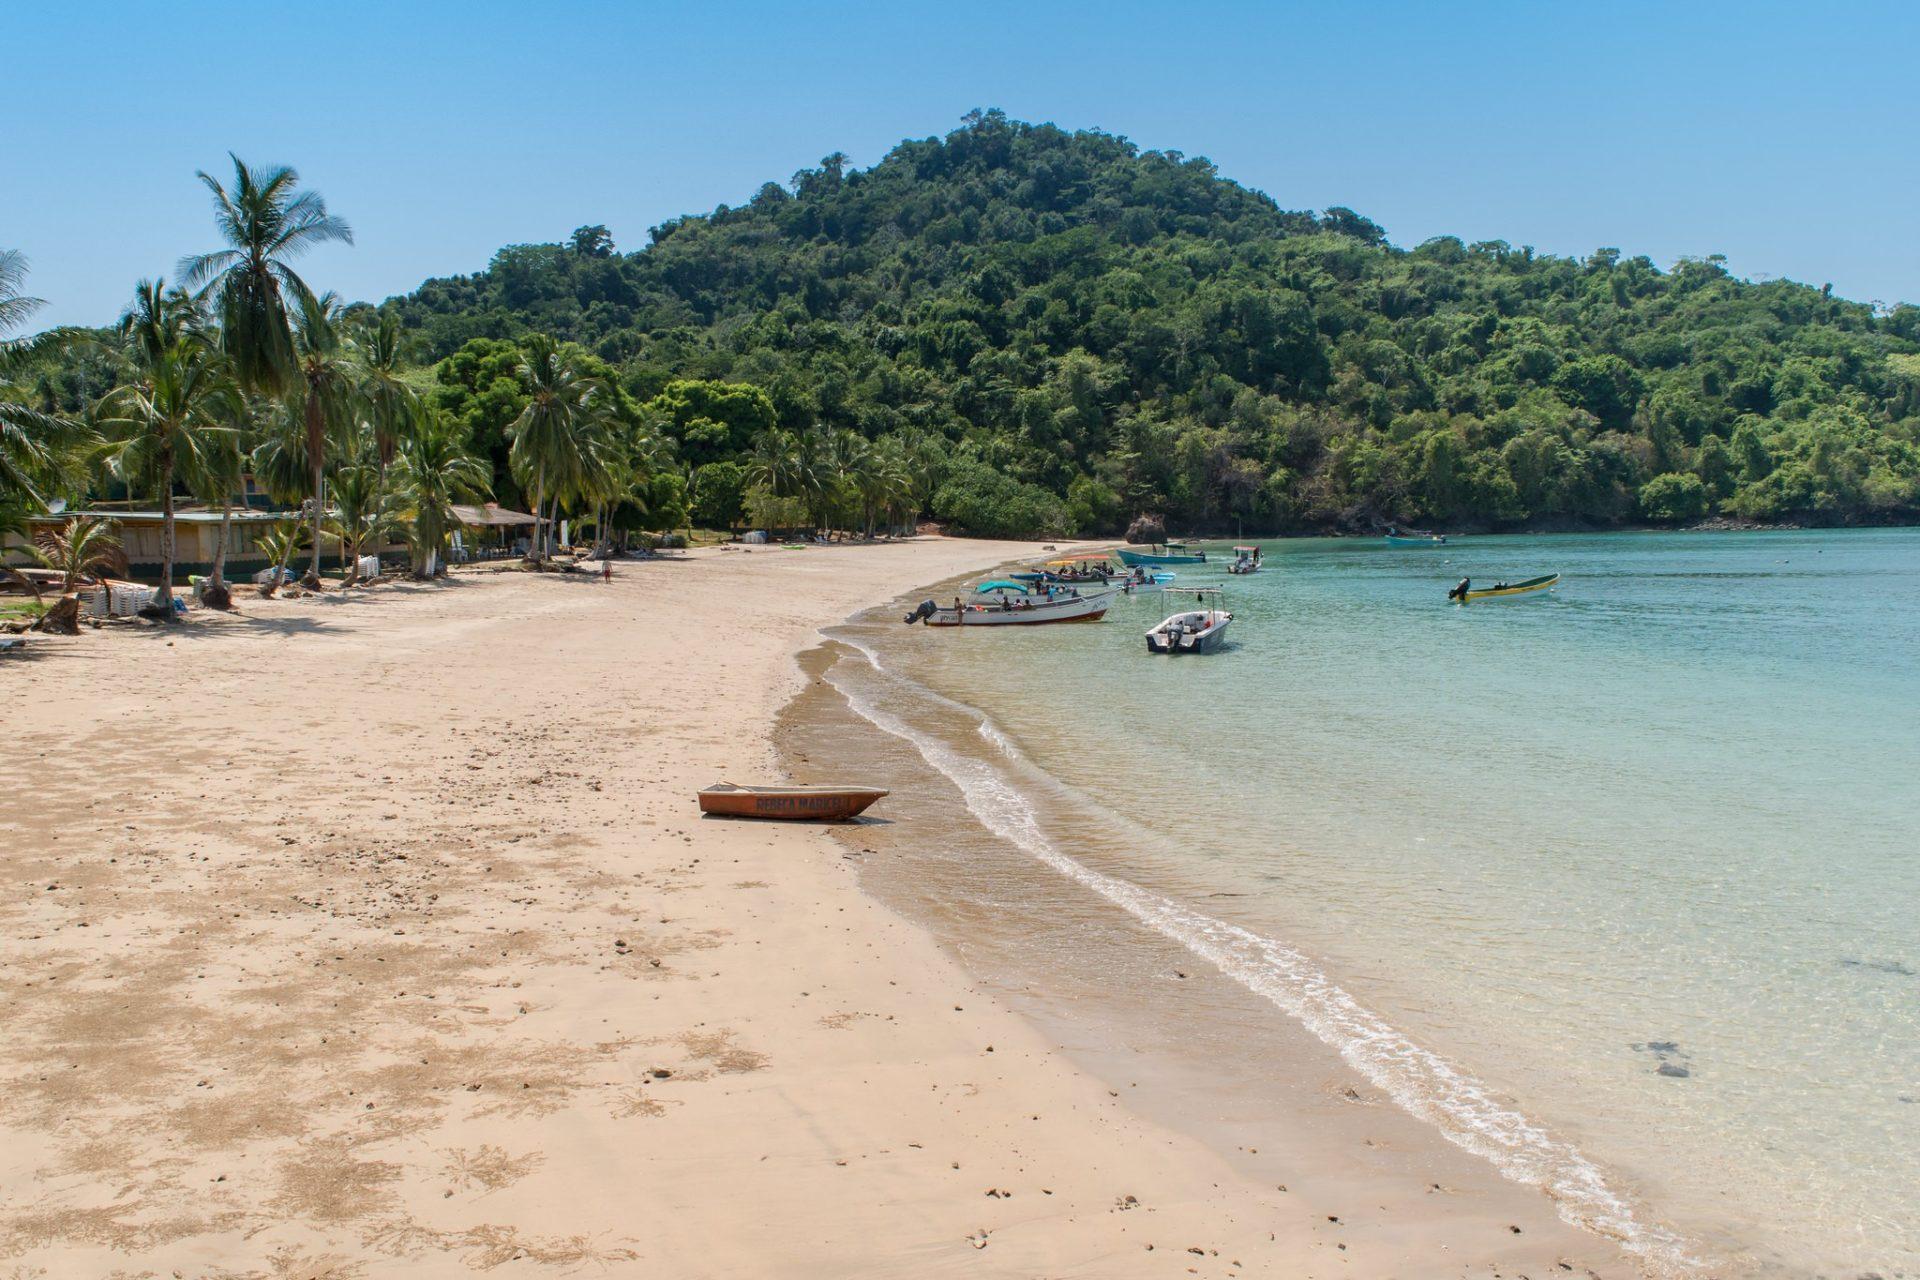 Insel Coiba Strand, Santa Catalina, Panama